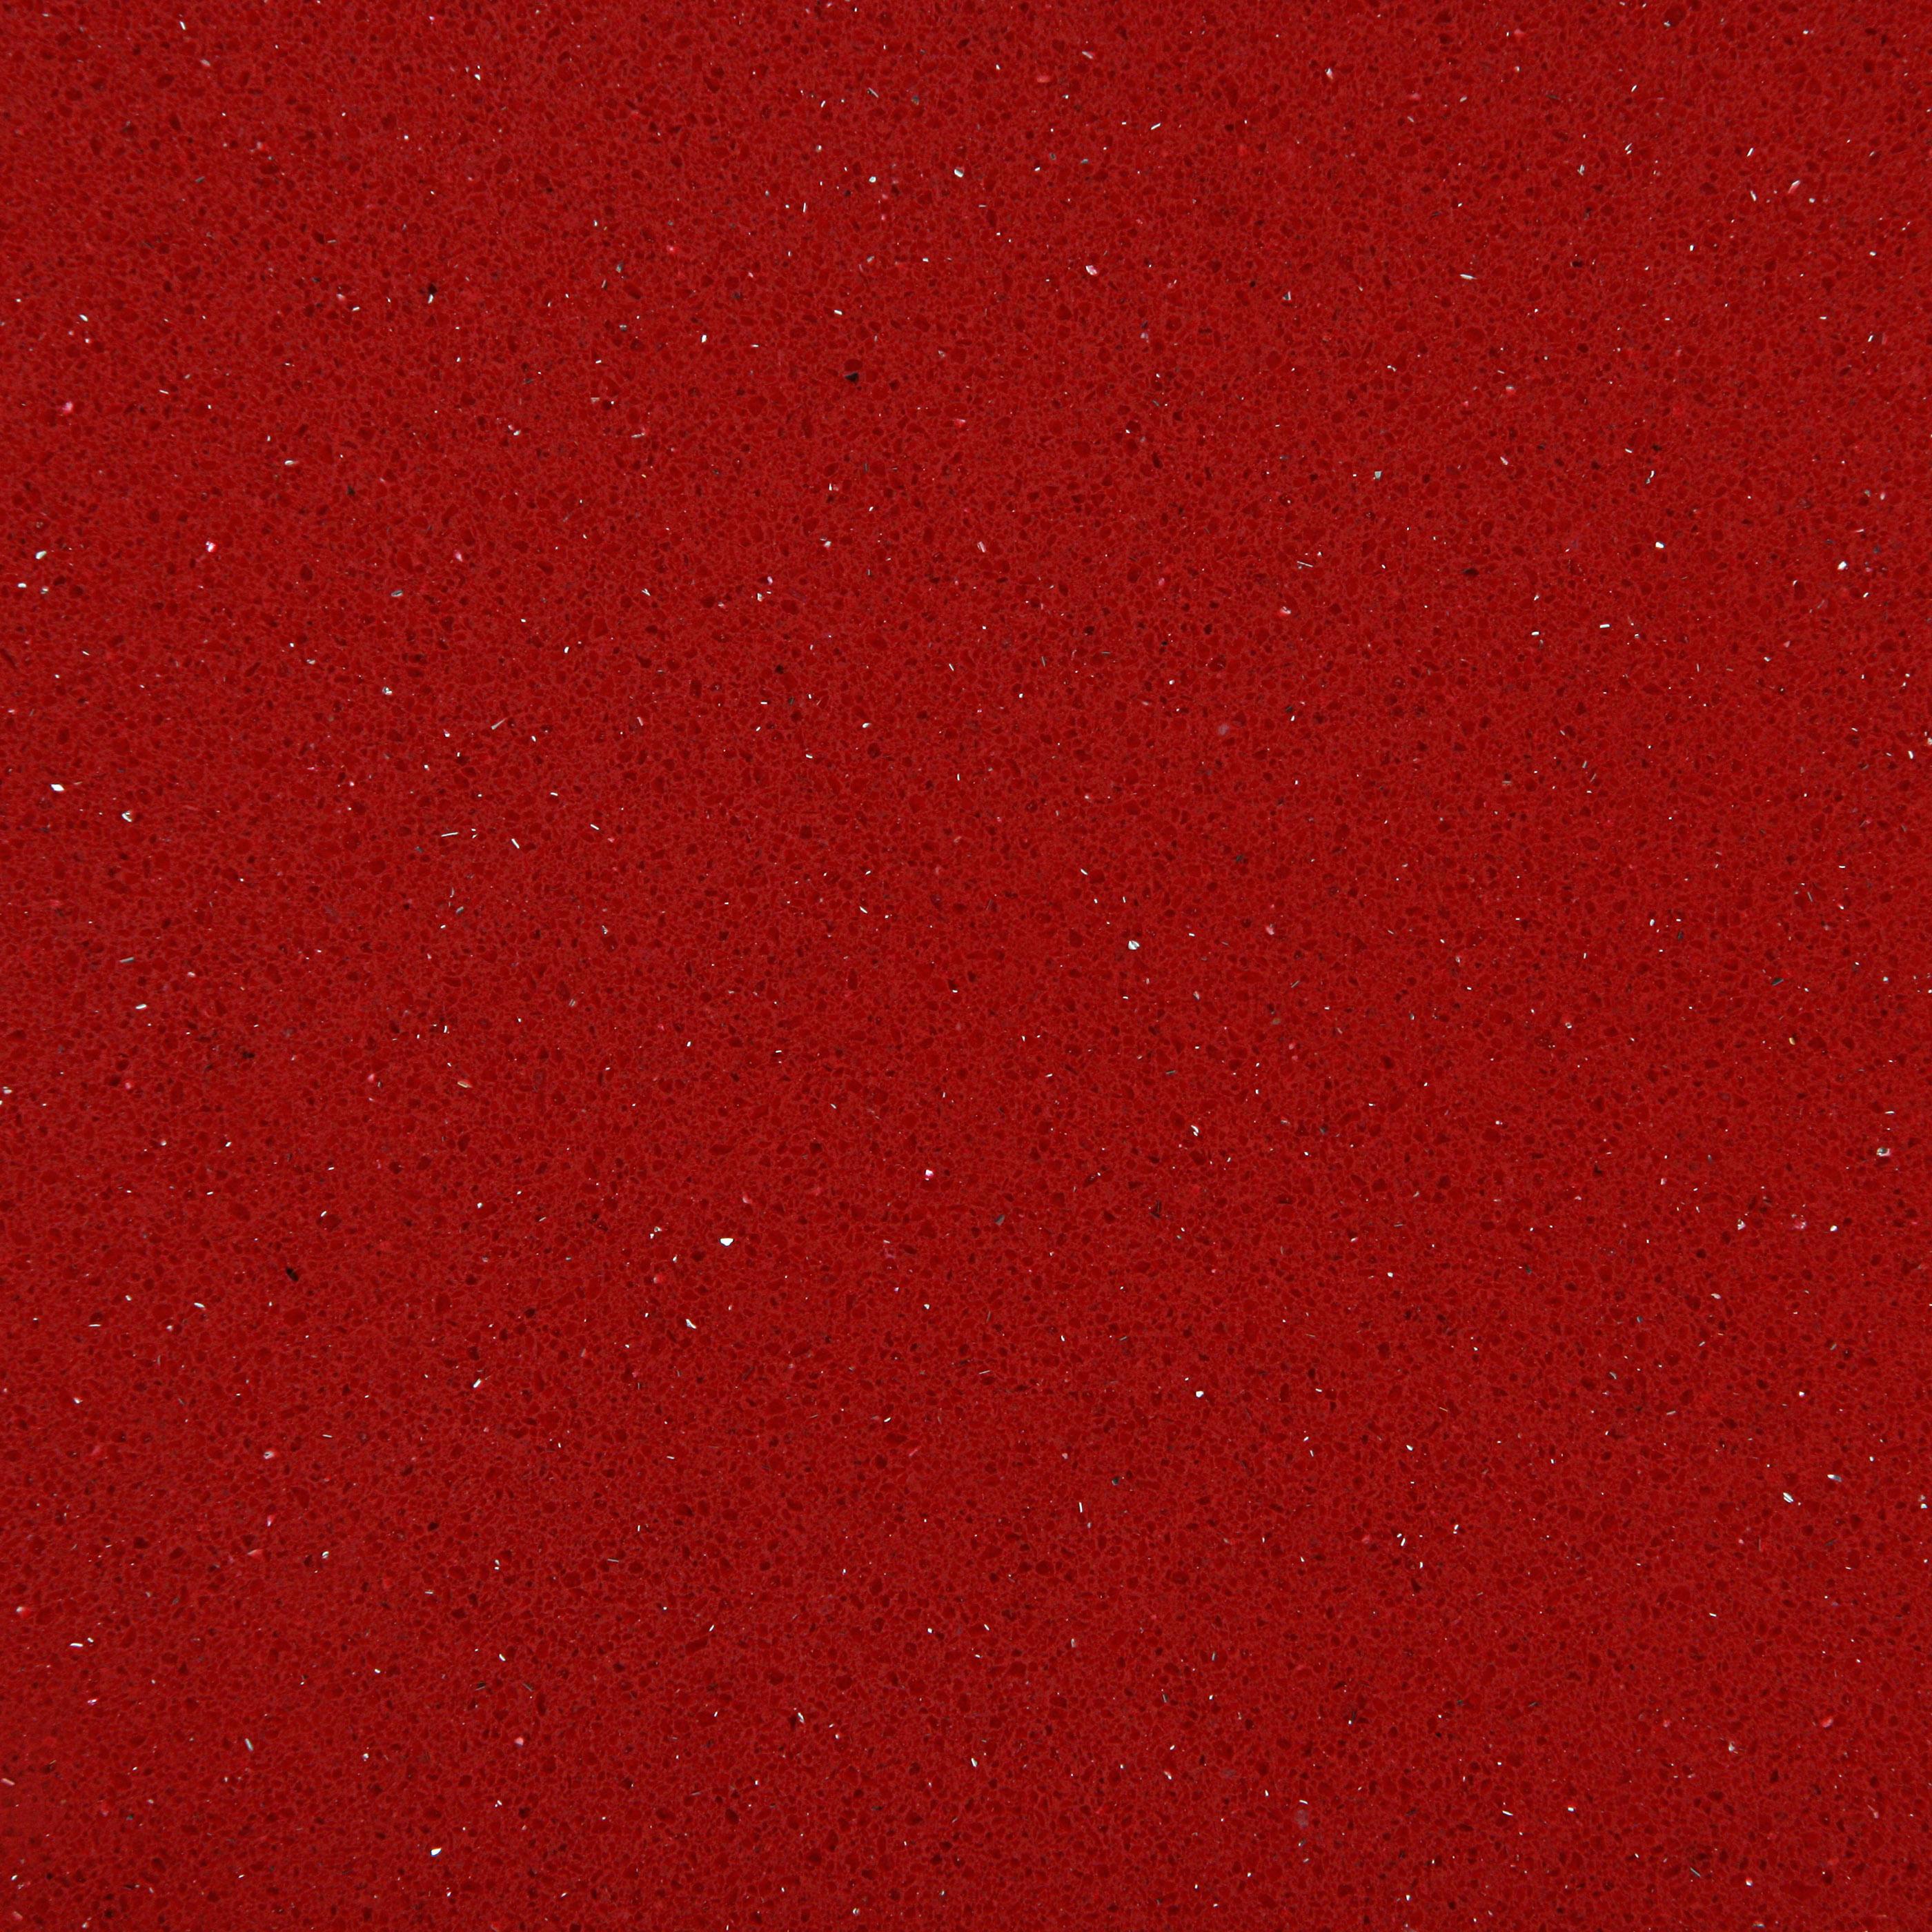 Red Shimmer - 3452